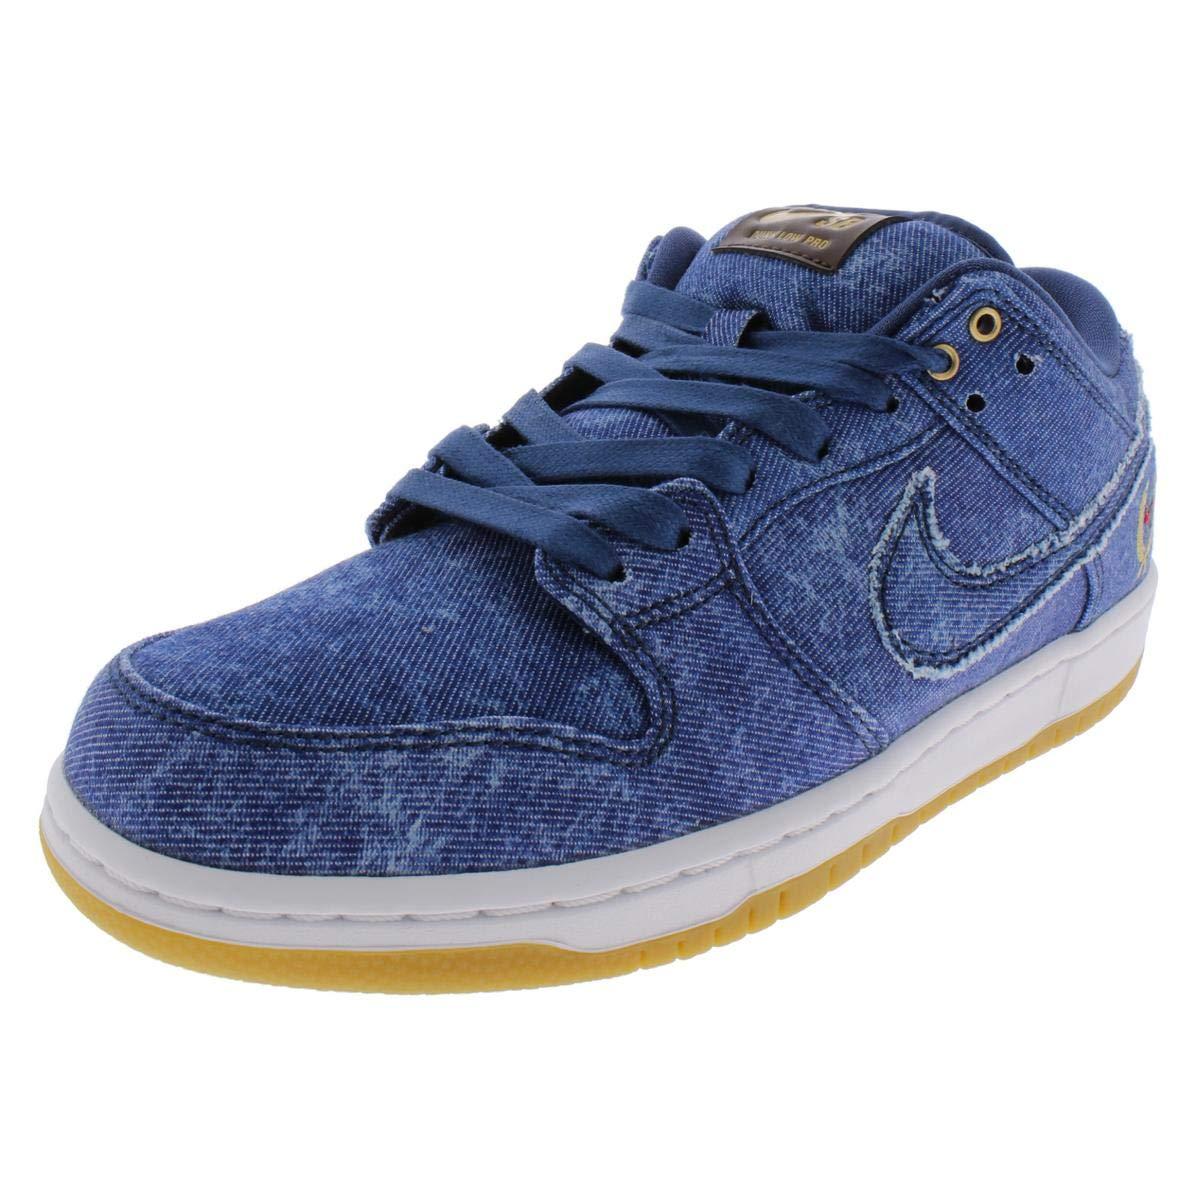 Nike SB Dunk Low TRD QS Mens Skateboarding Shoes (7 D(M) US)